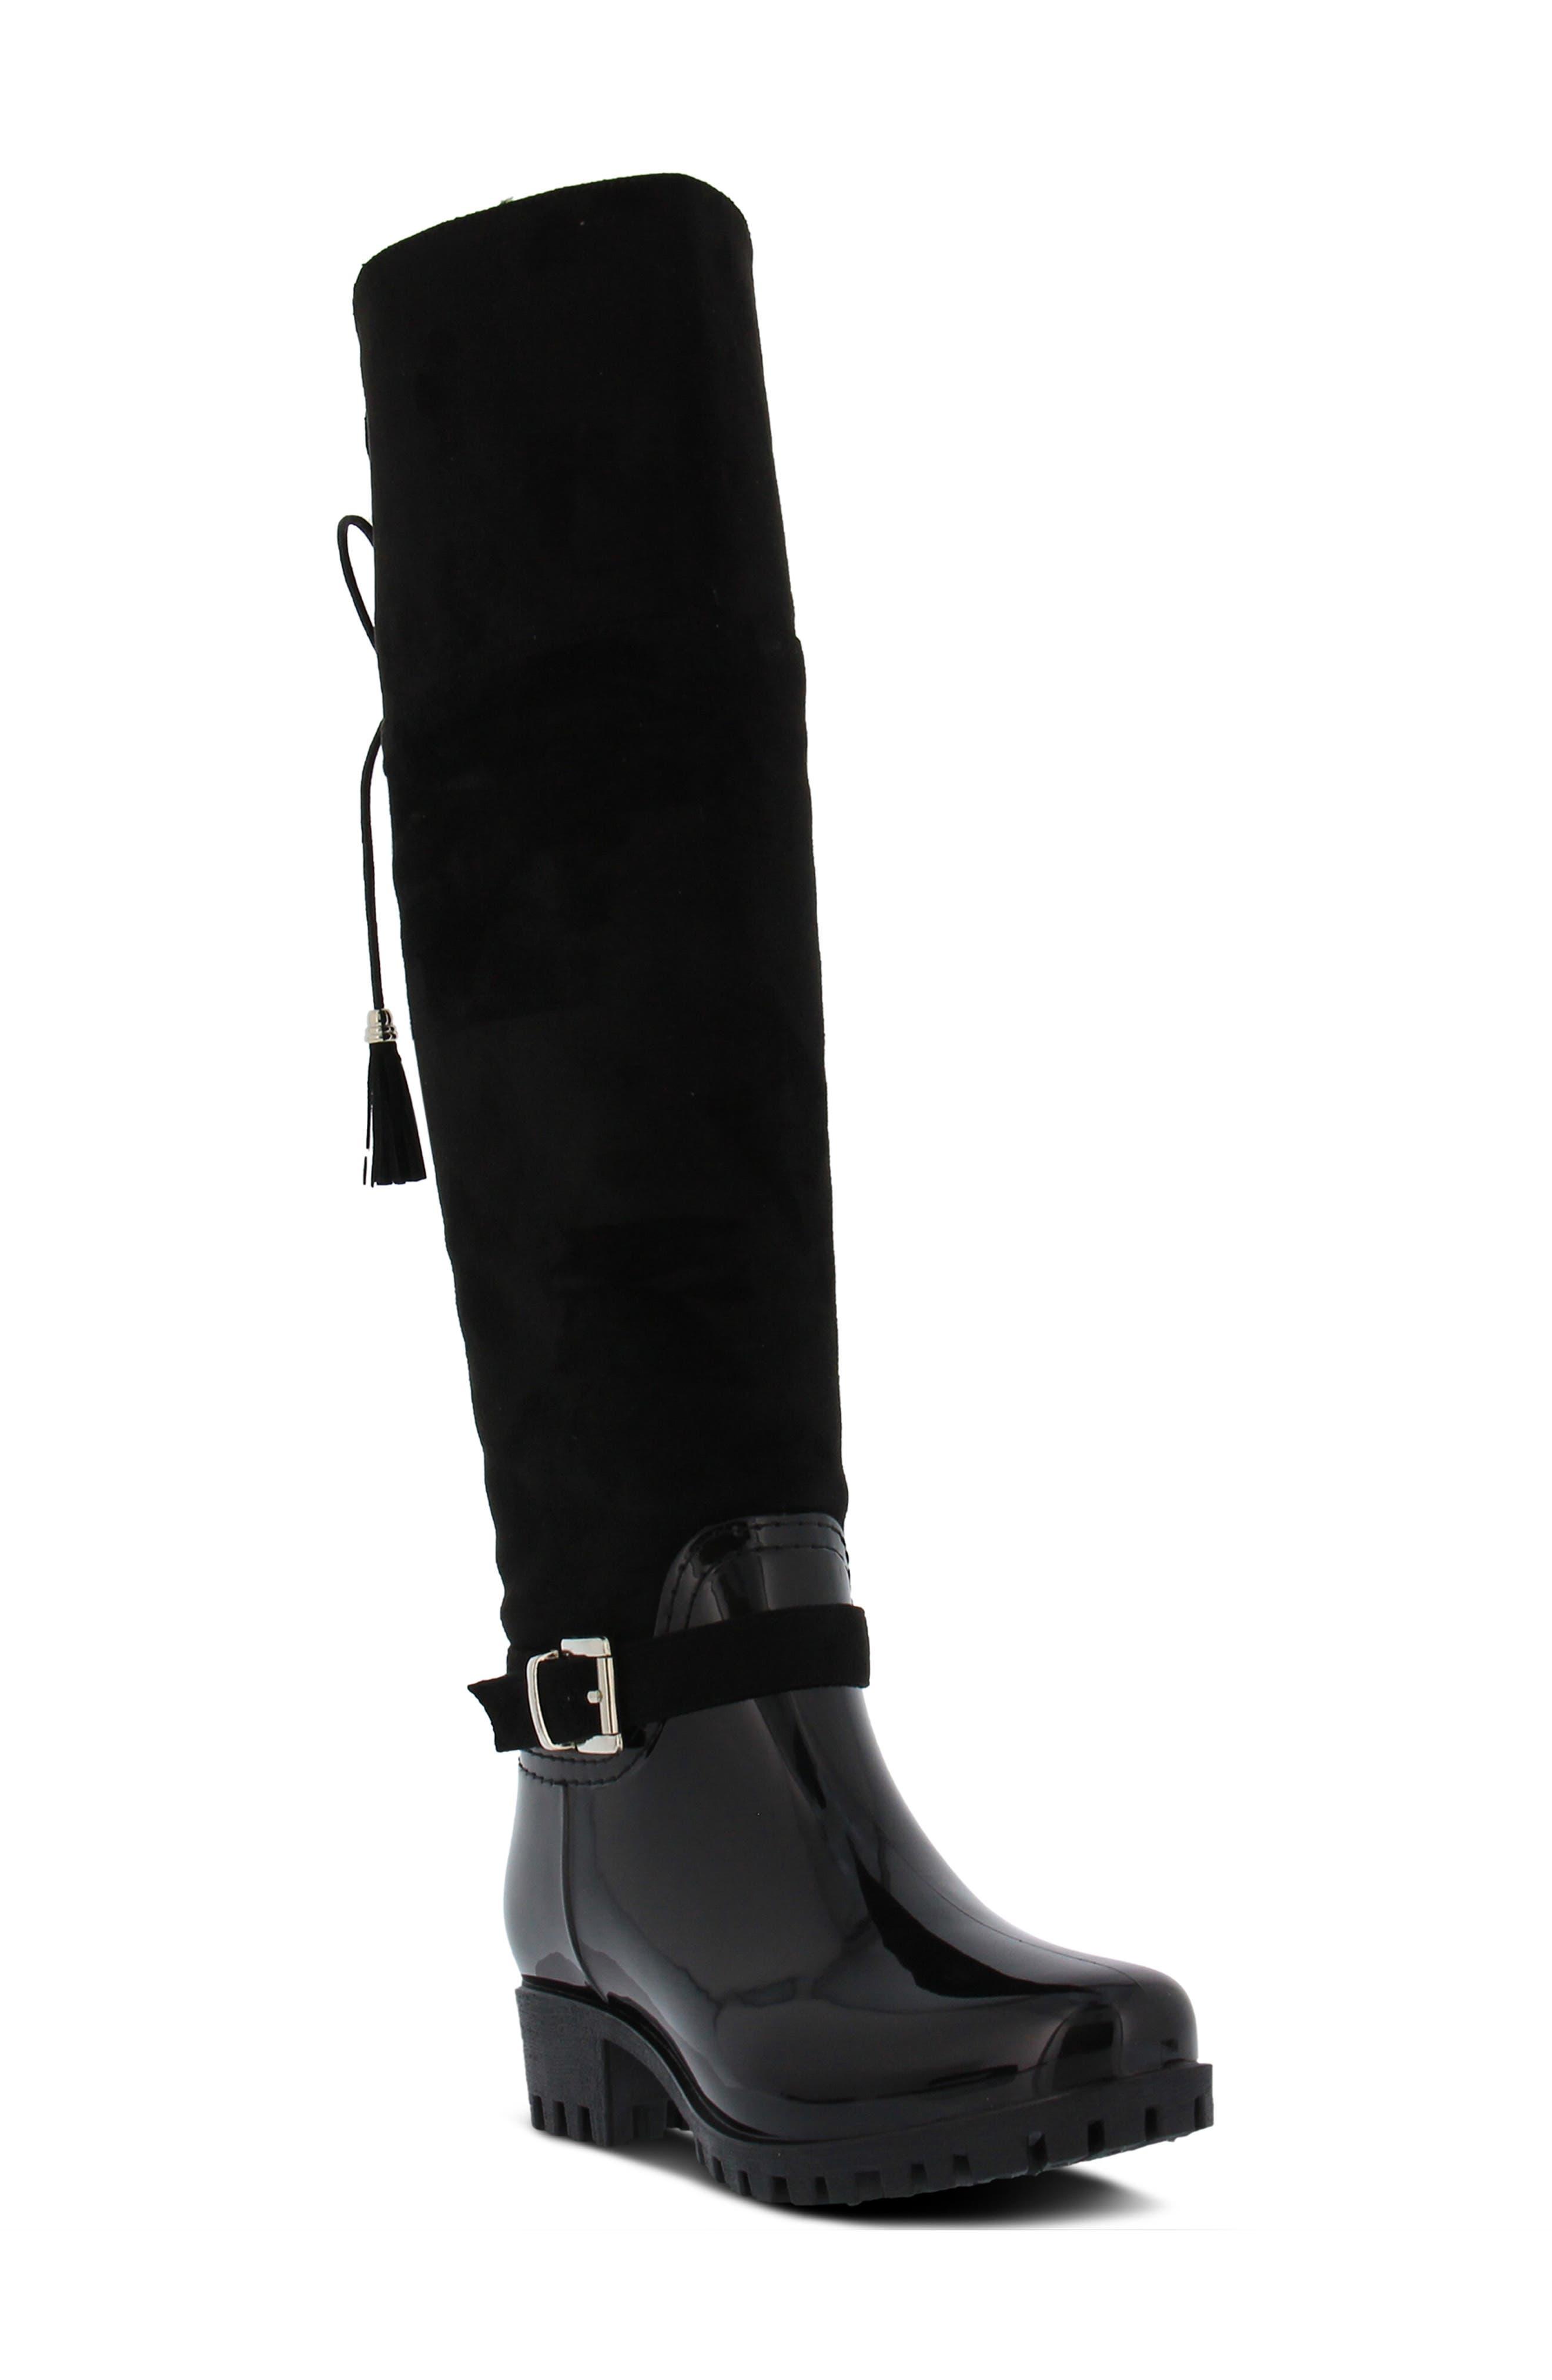 Spring Step Mattie Over The Knee Waterproof Boot - Black